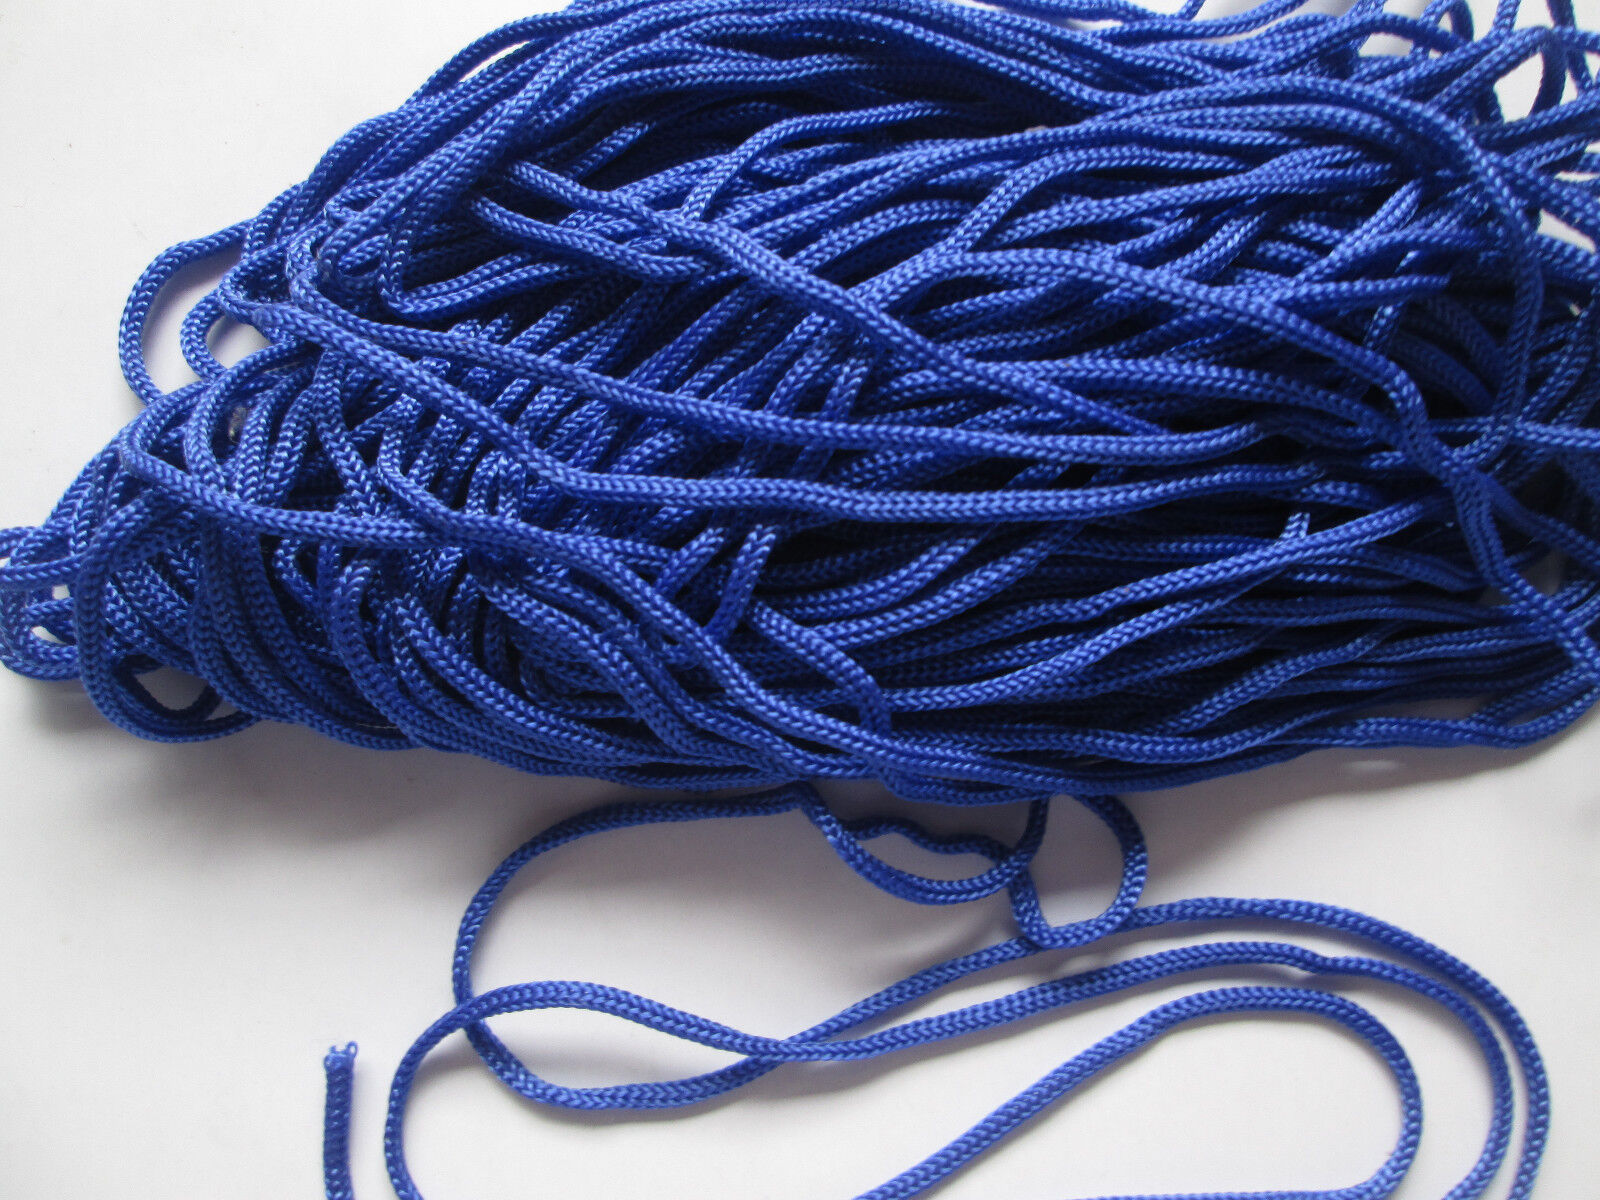 10 METER kordel Satin Blau 3mm elegante Borte Spitze KR 005